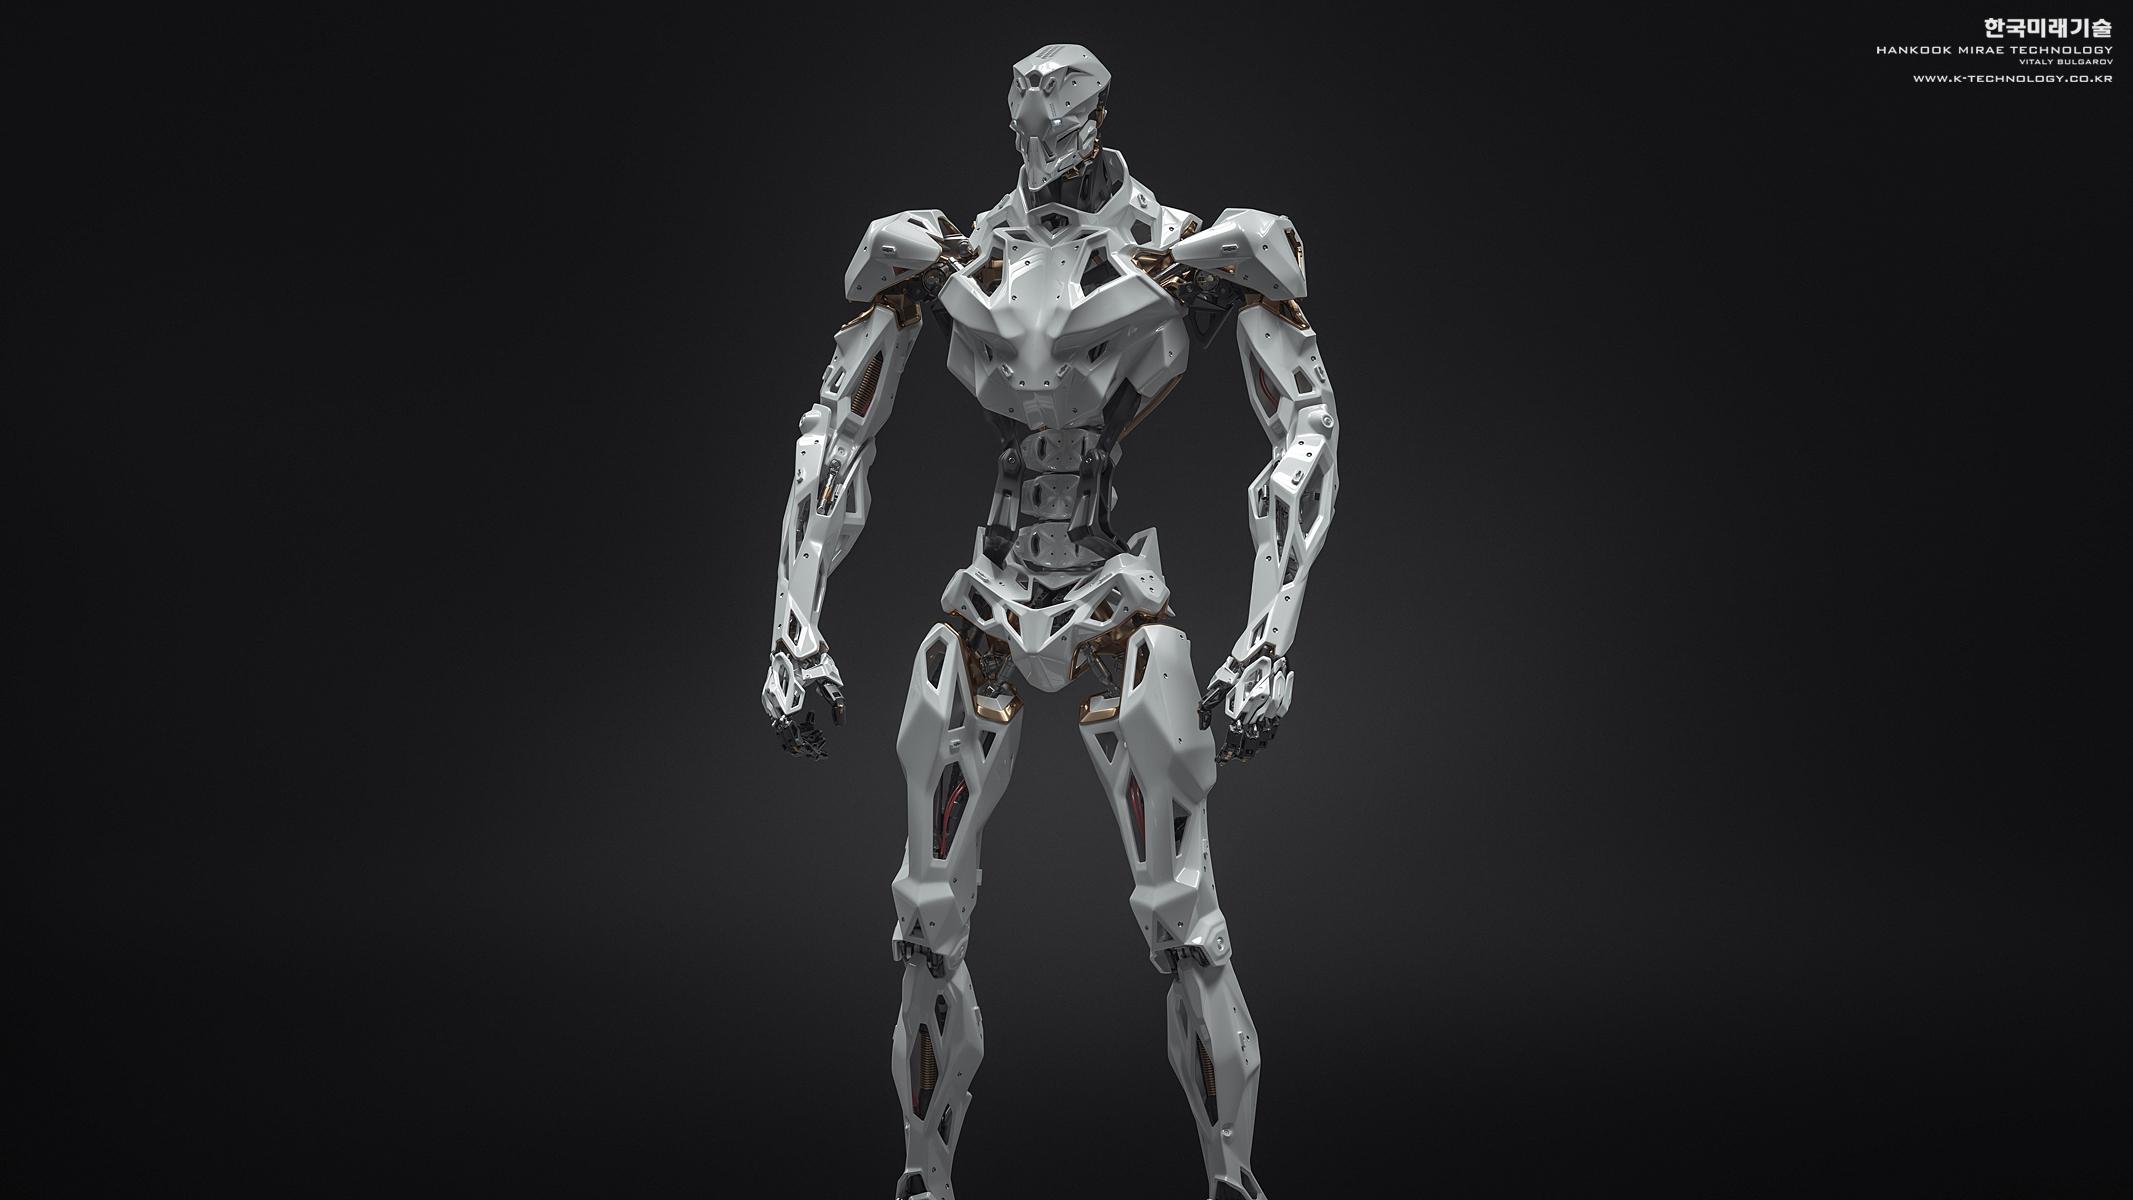 KFT_2.Xm_RobotDesign_ (15 of 29).jpg